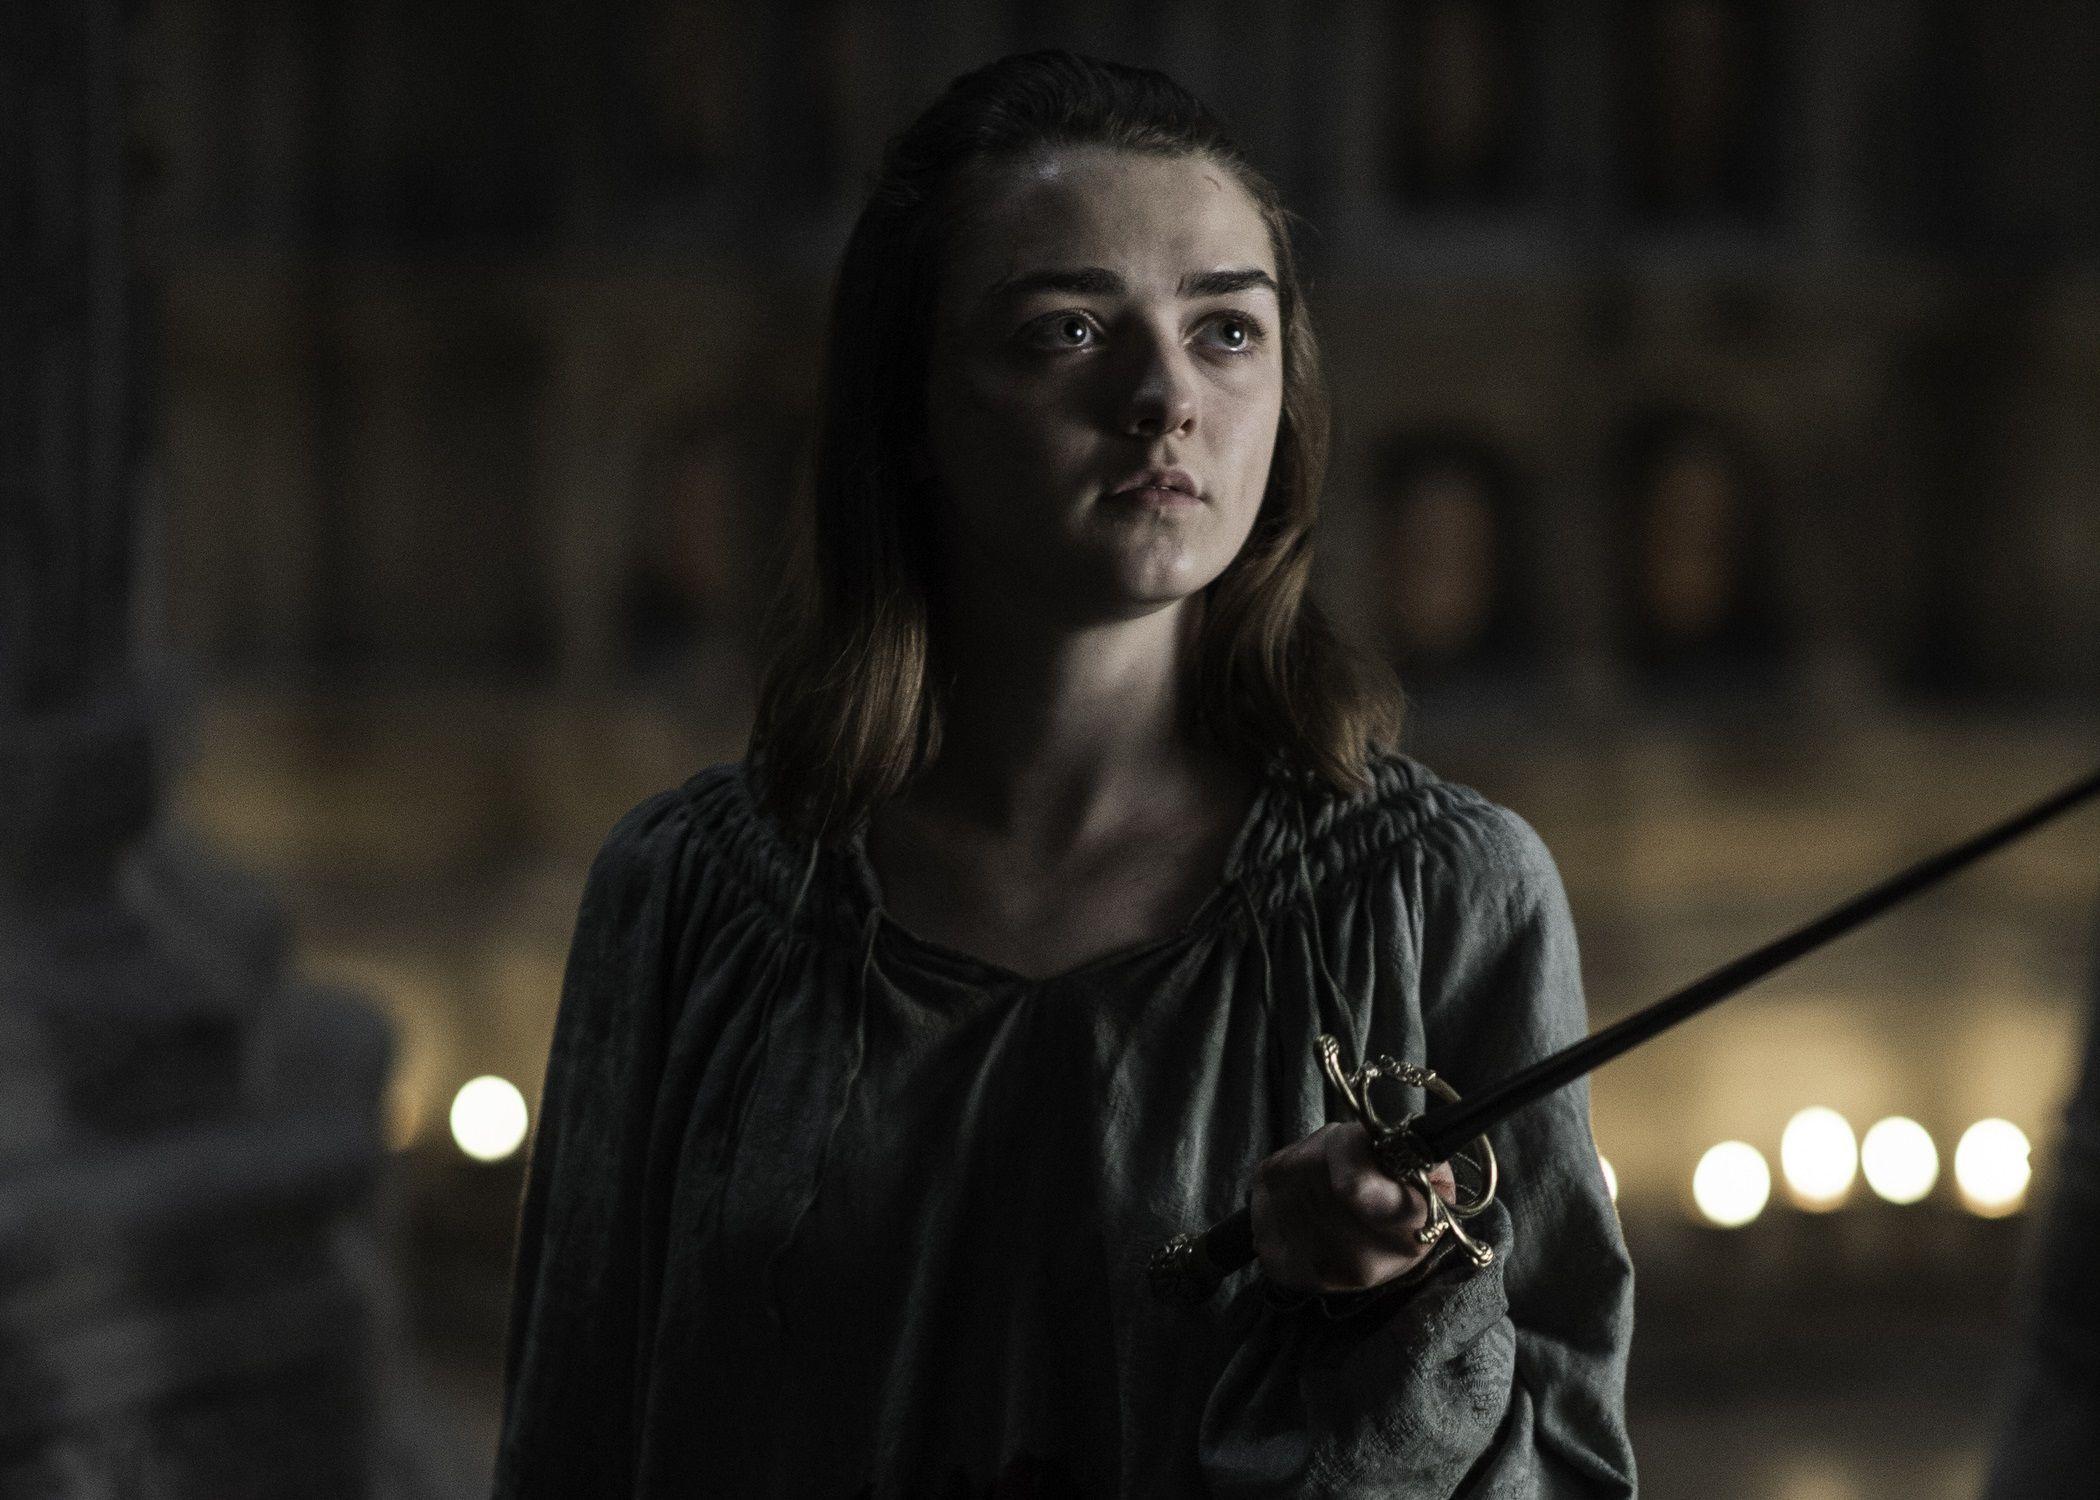 Arya Stark Wallpapers Top Free Arya Stark Backgrounds